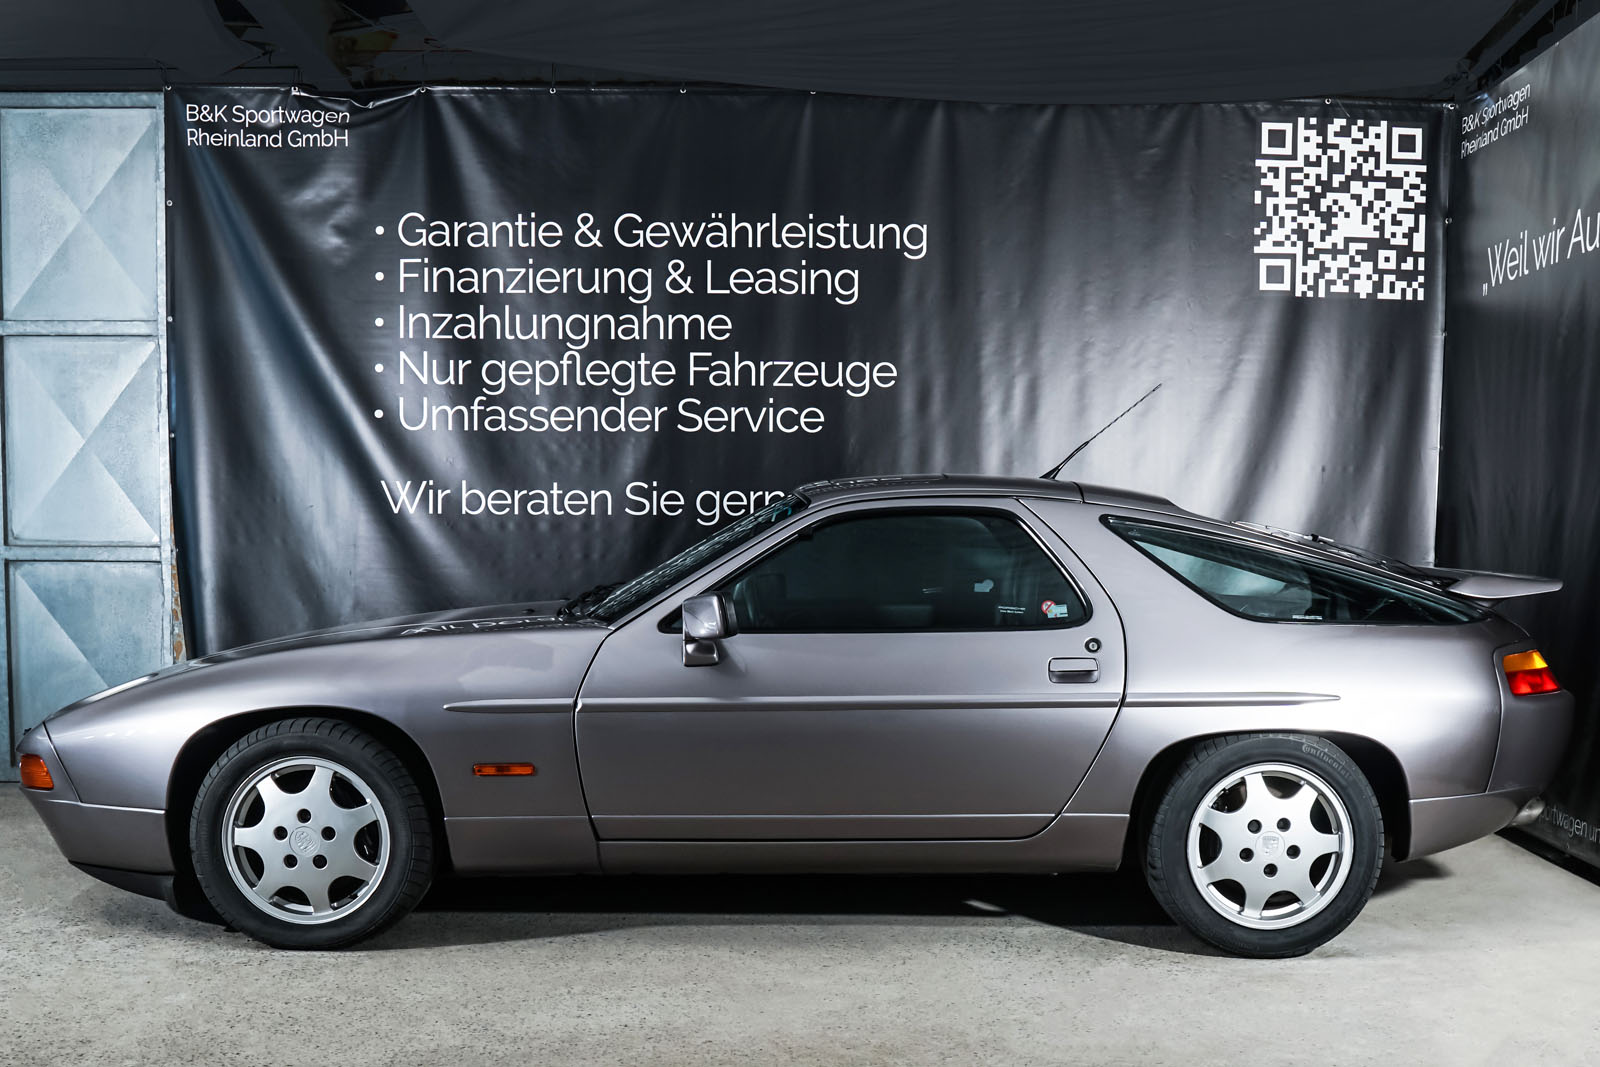 Porsche_928_Grau_Schwarz_POR-0325_5_w